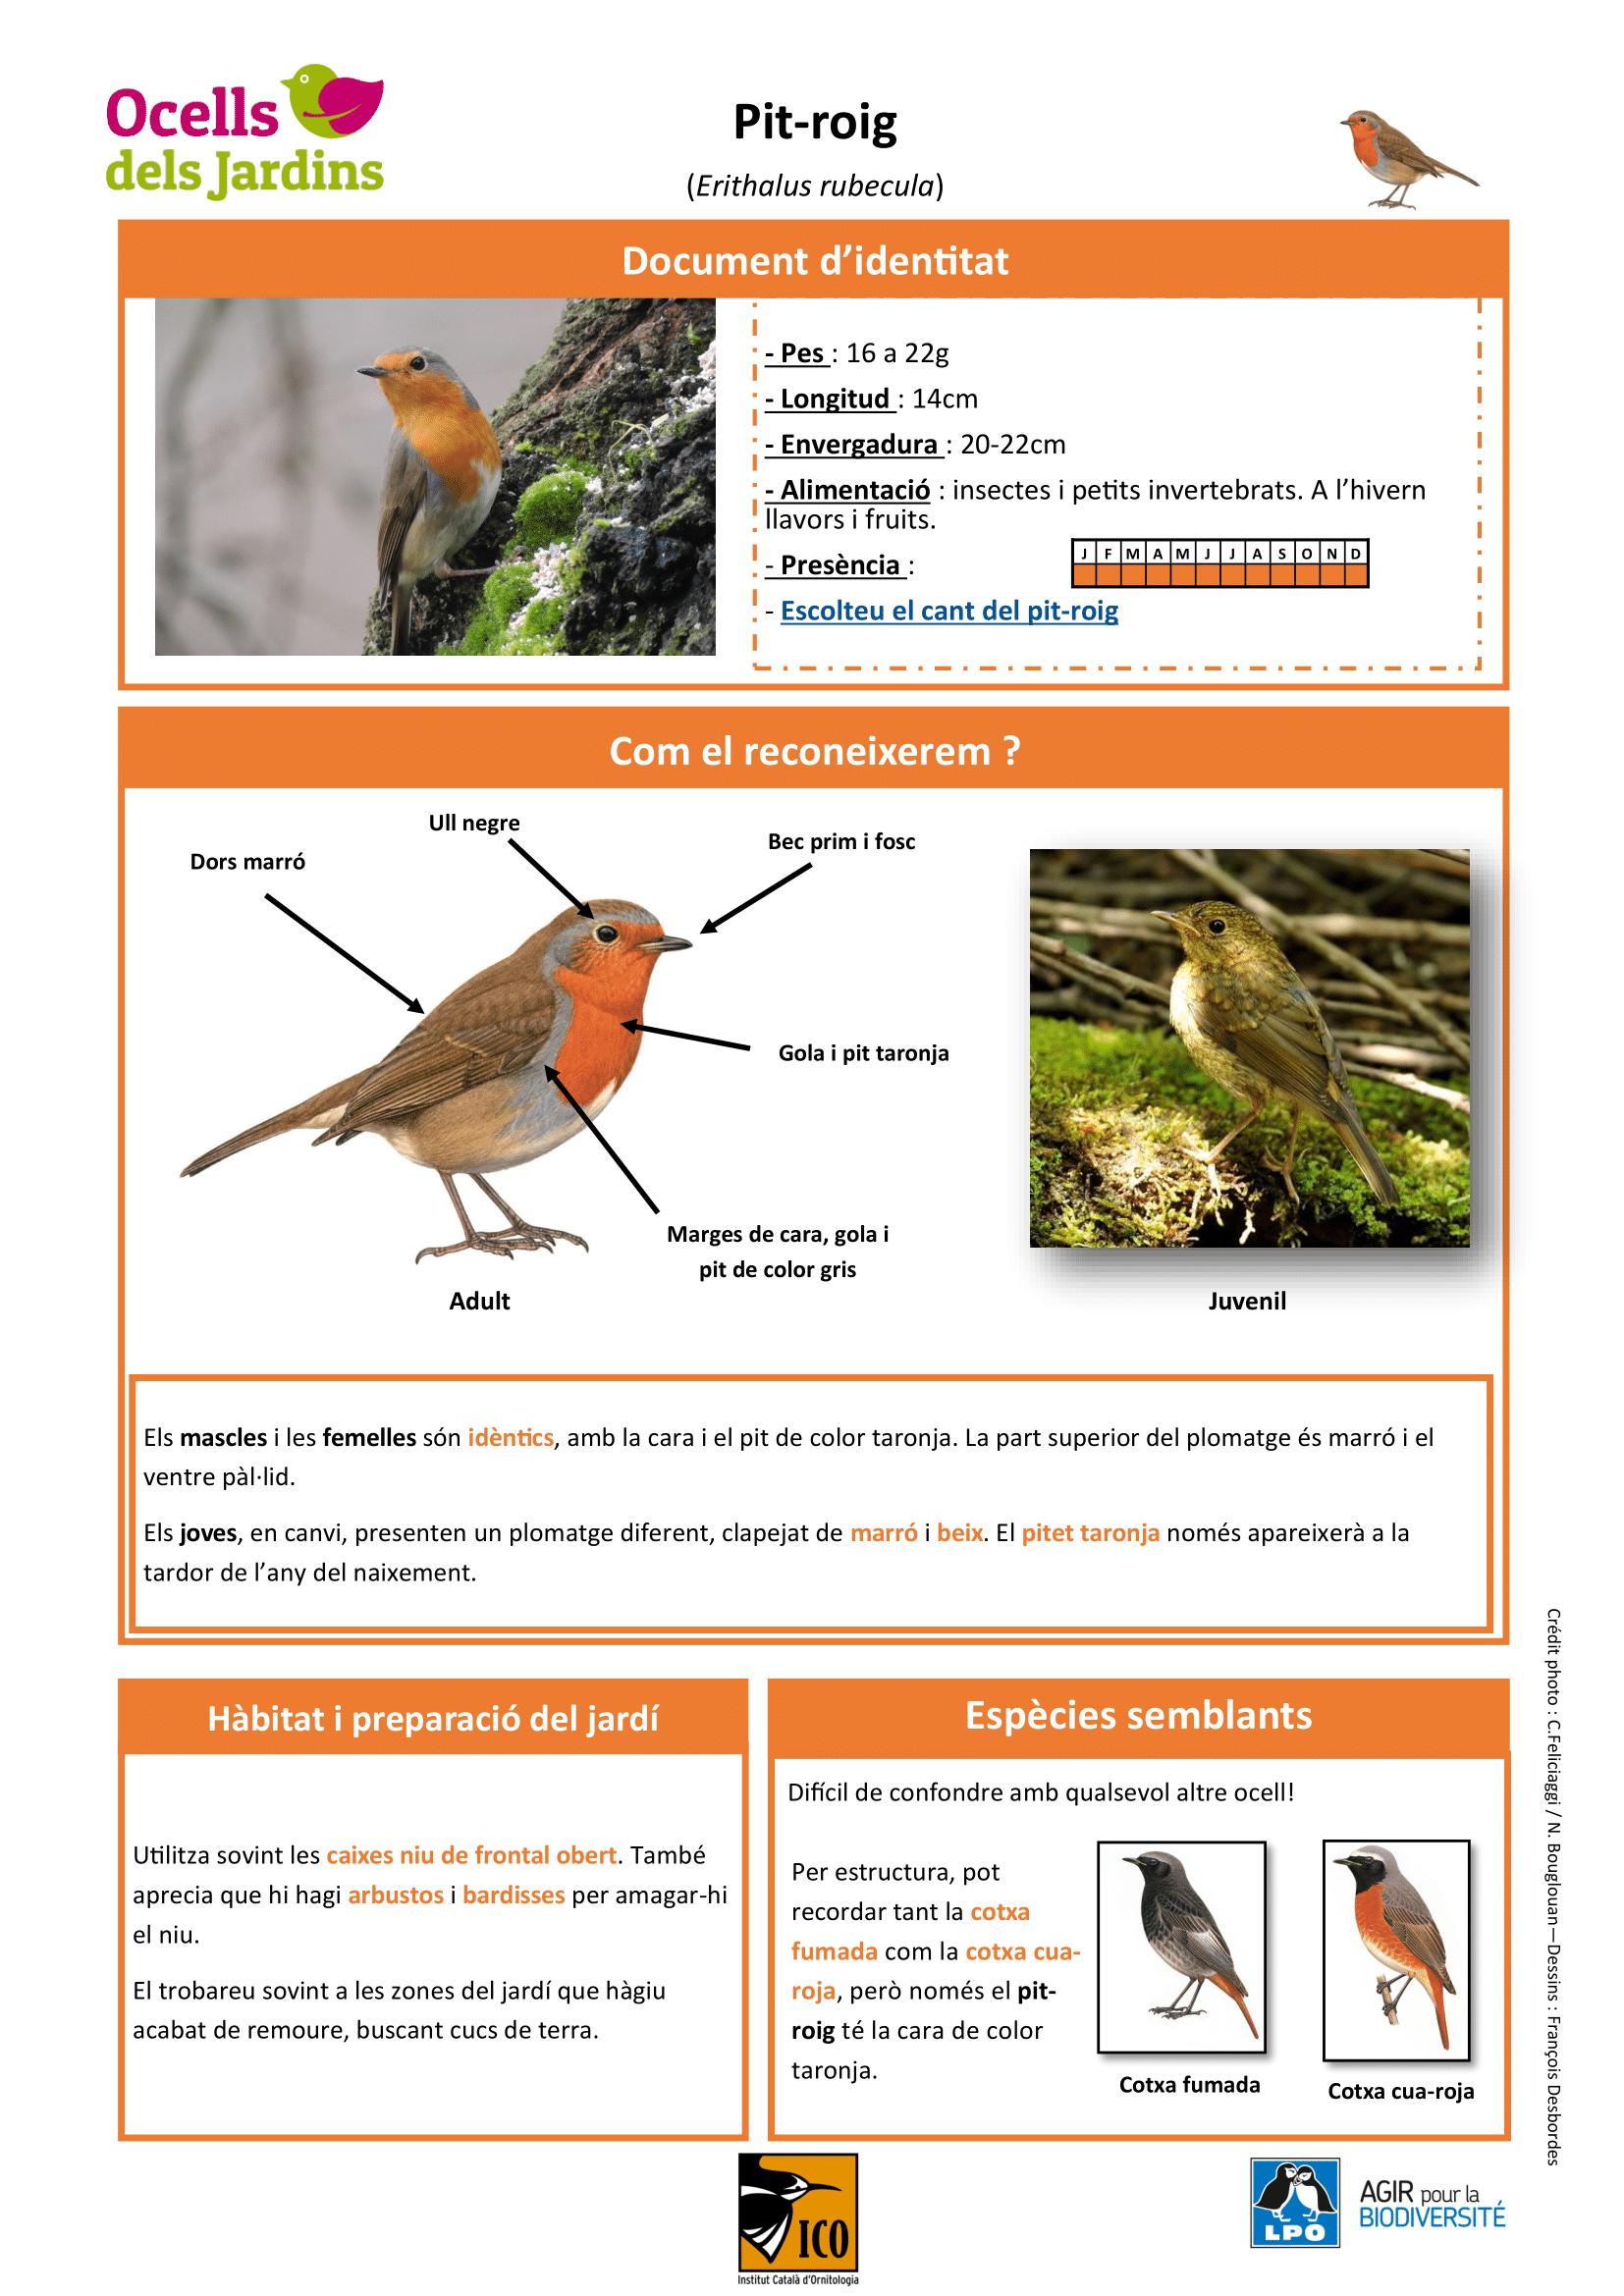 https://cdnfiles1.biolovision.net/www.ocellsdelsjardins.cat/userfiles/pitroig-1.png